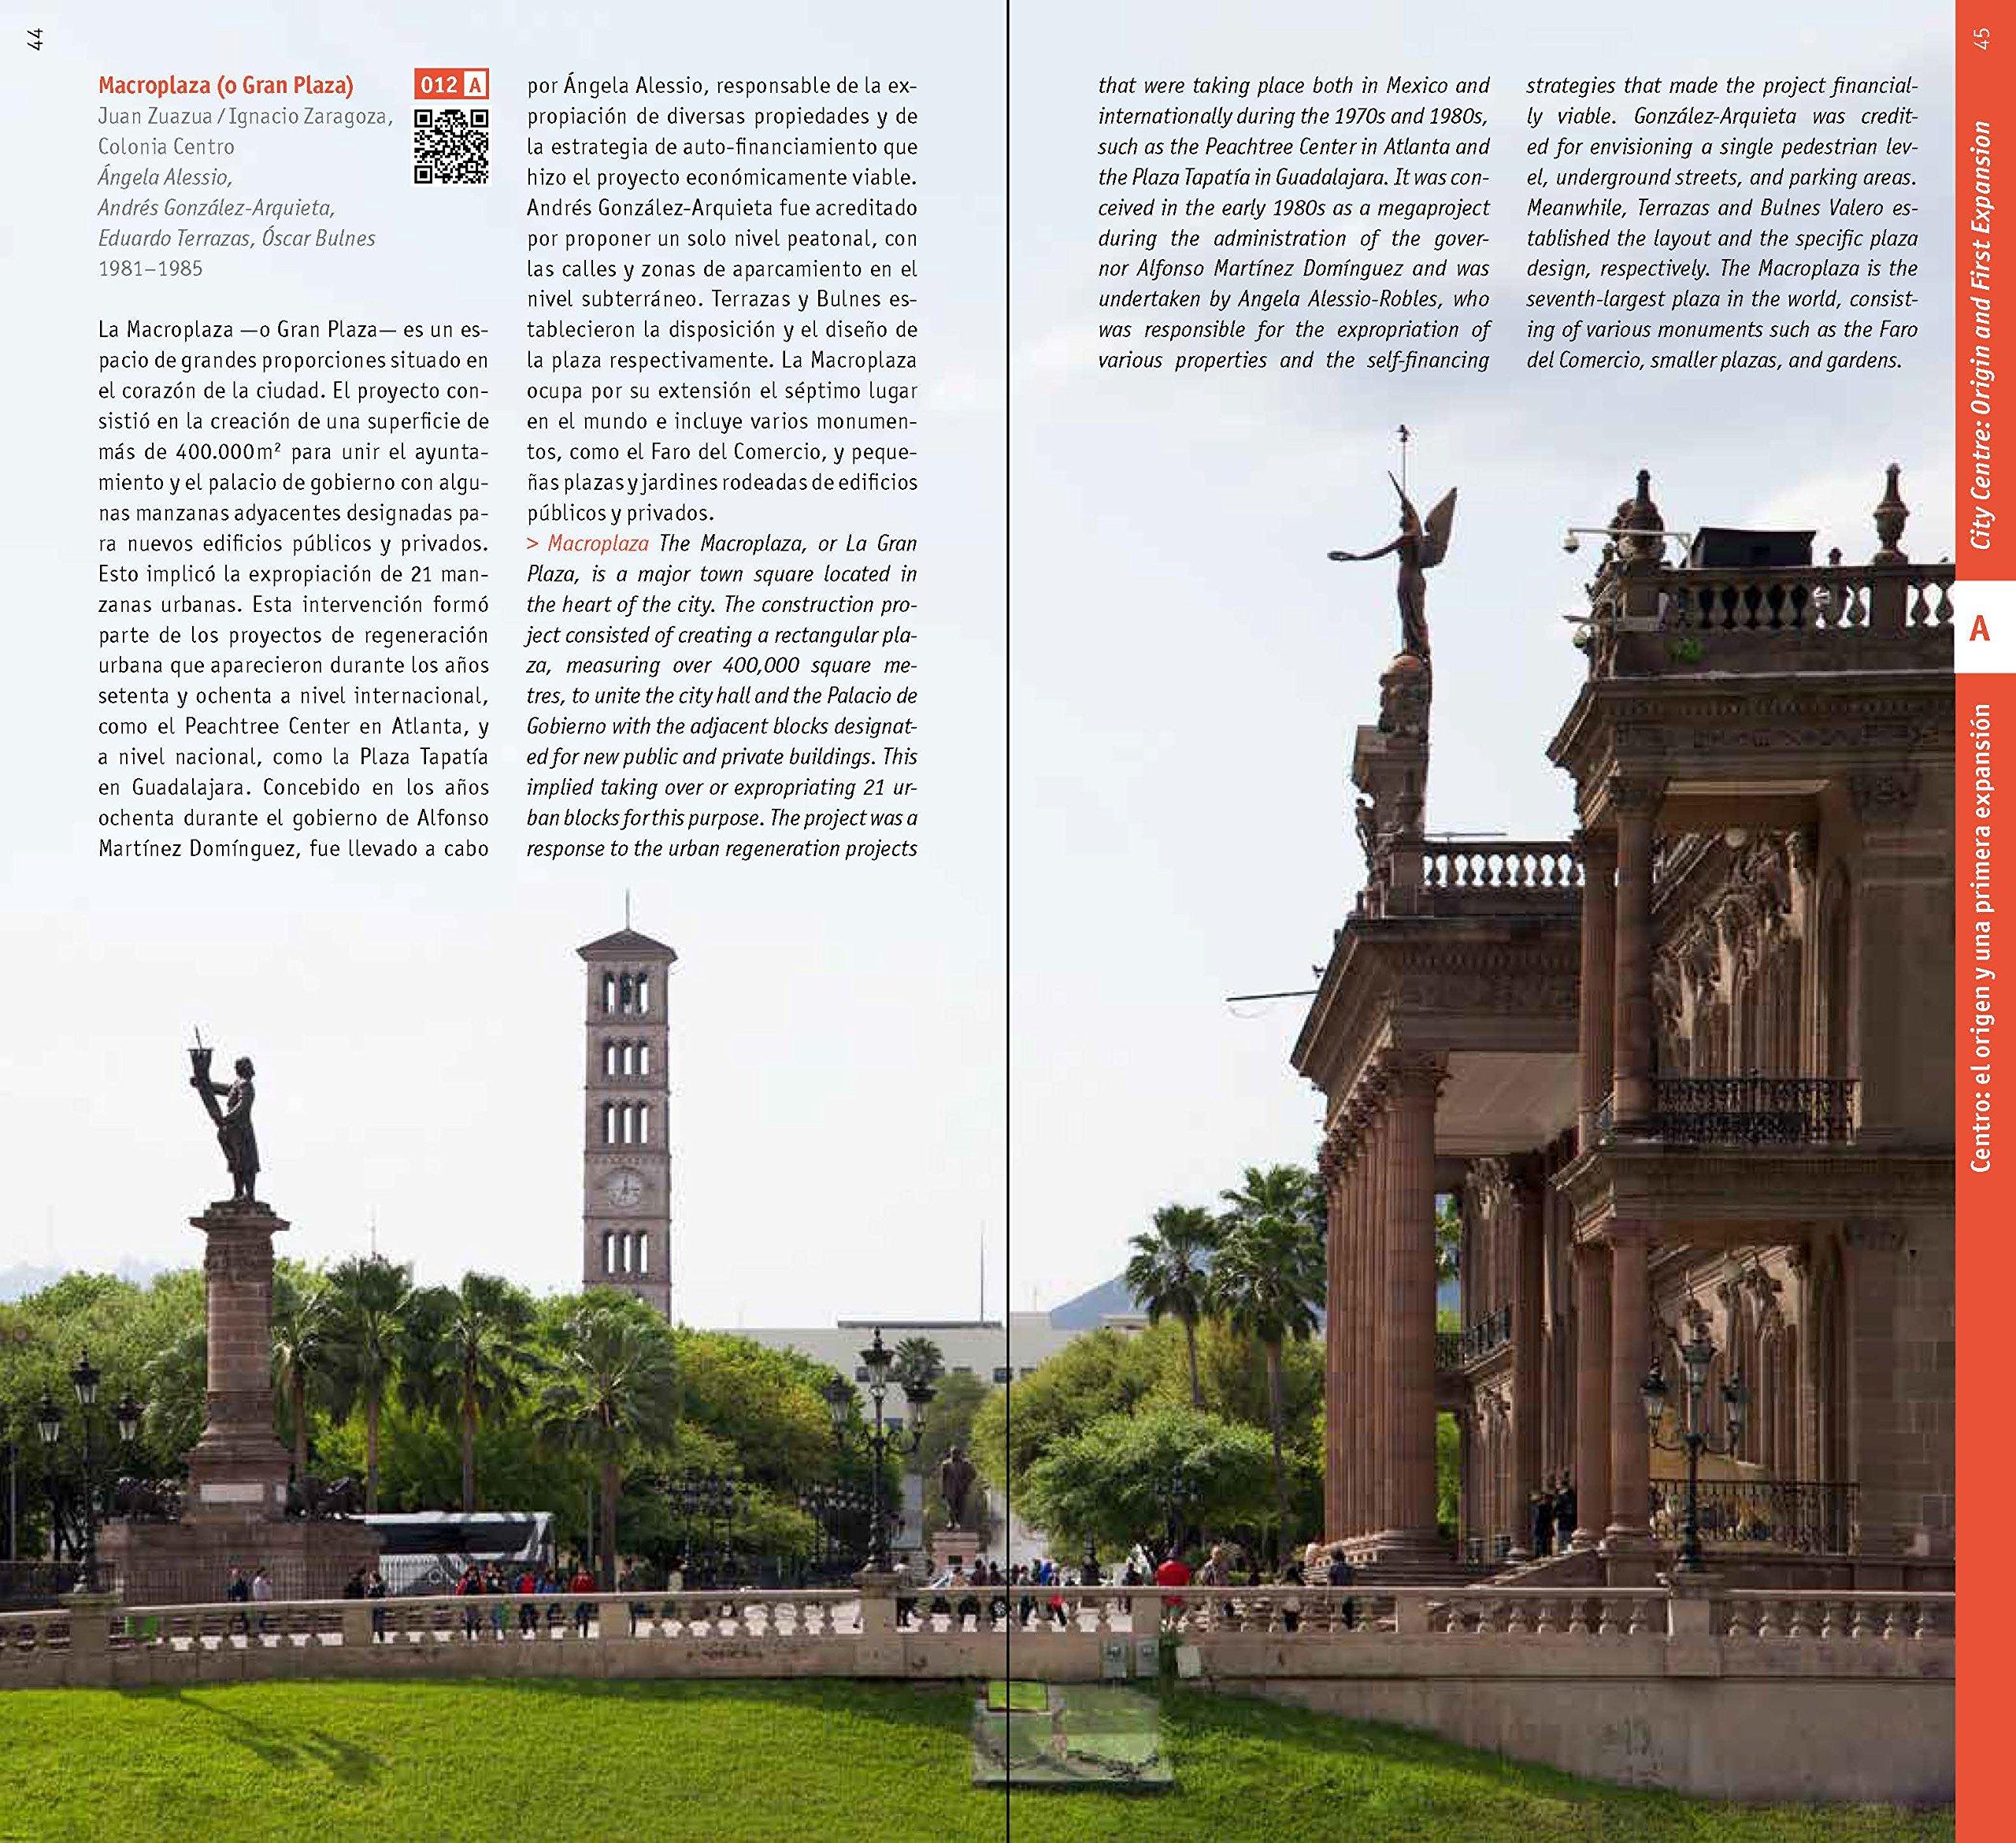 Monterrey. Architectural Guide: Amazon.es: Carsten Krohn, Celia Esther Arredondo Zambrano: Libros